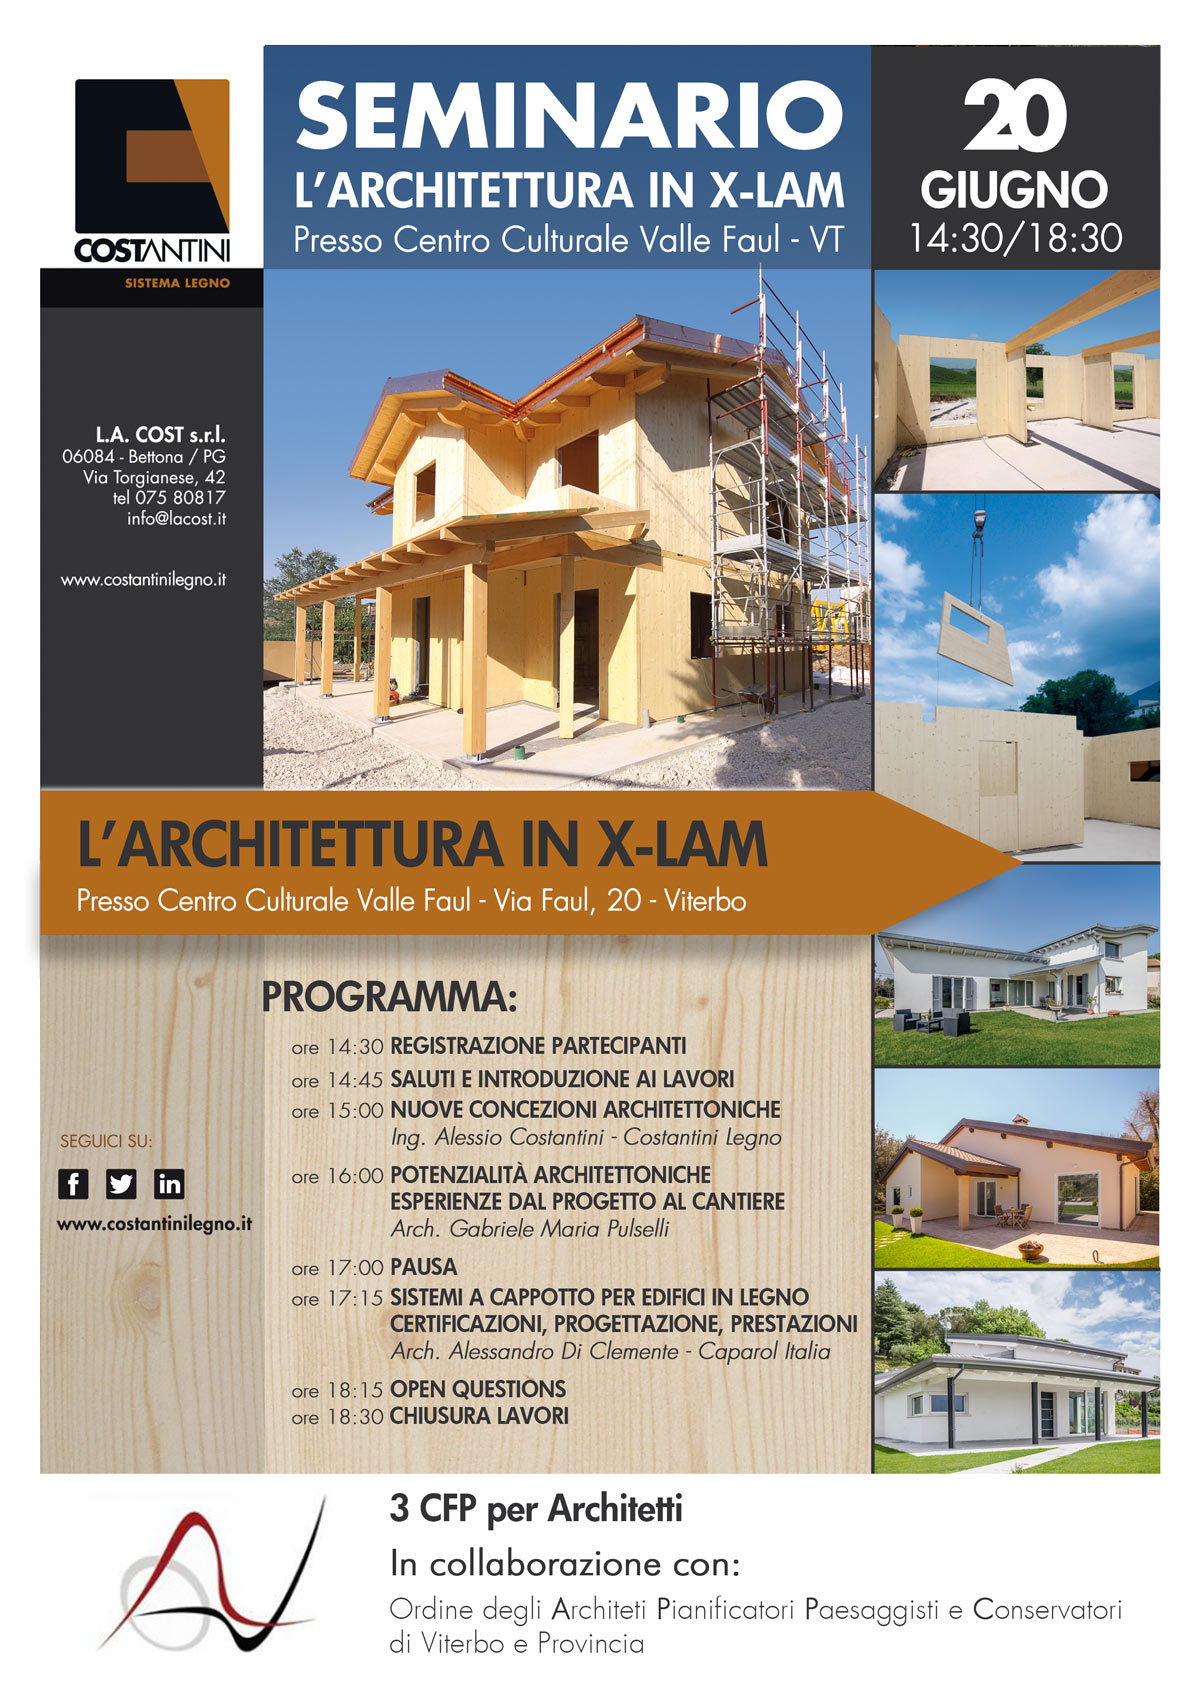 Locandina Seminario L'Architettura in X-LAM - Viterbo